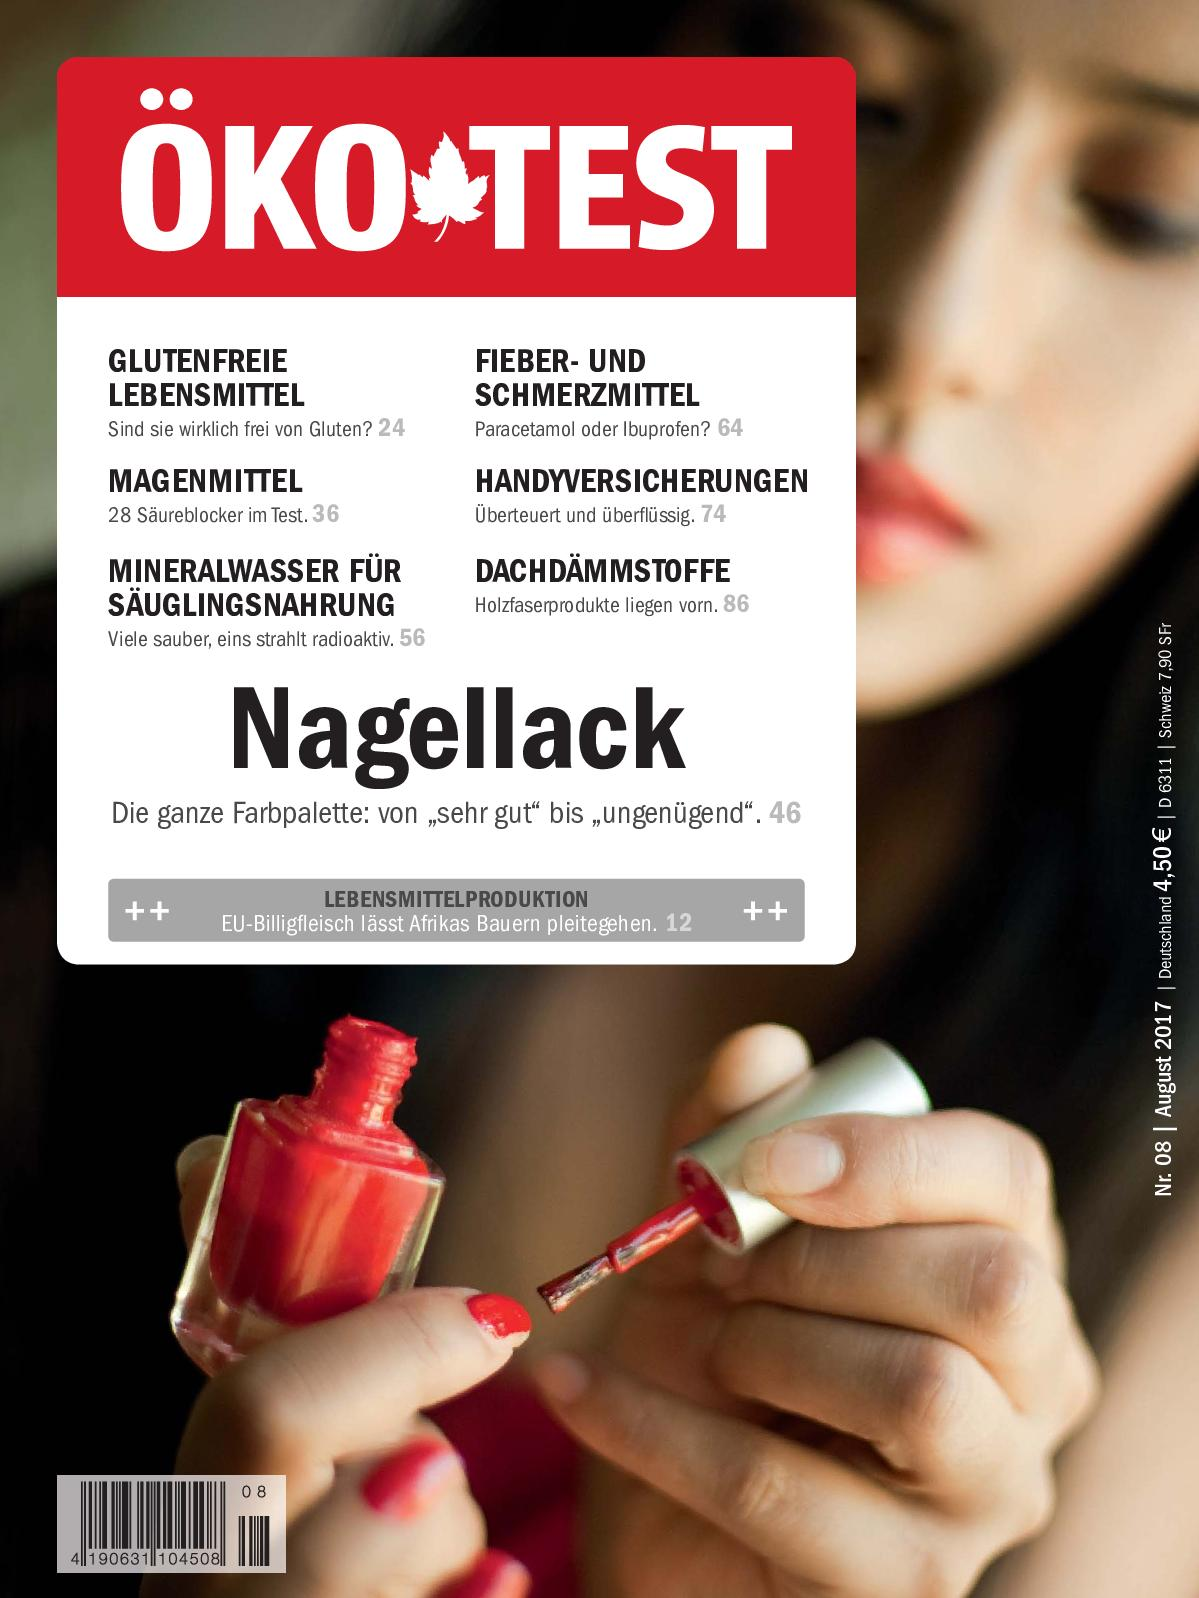 Parfüm Regal Großen Kapazität Aromatischer Geschmack Zeigen Nagellack Regal